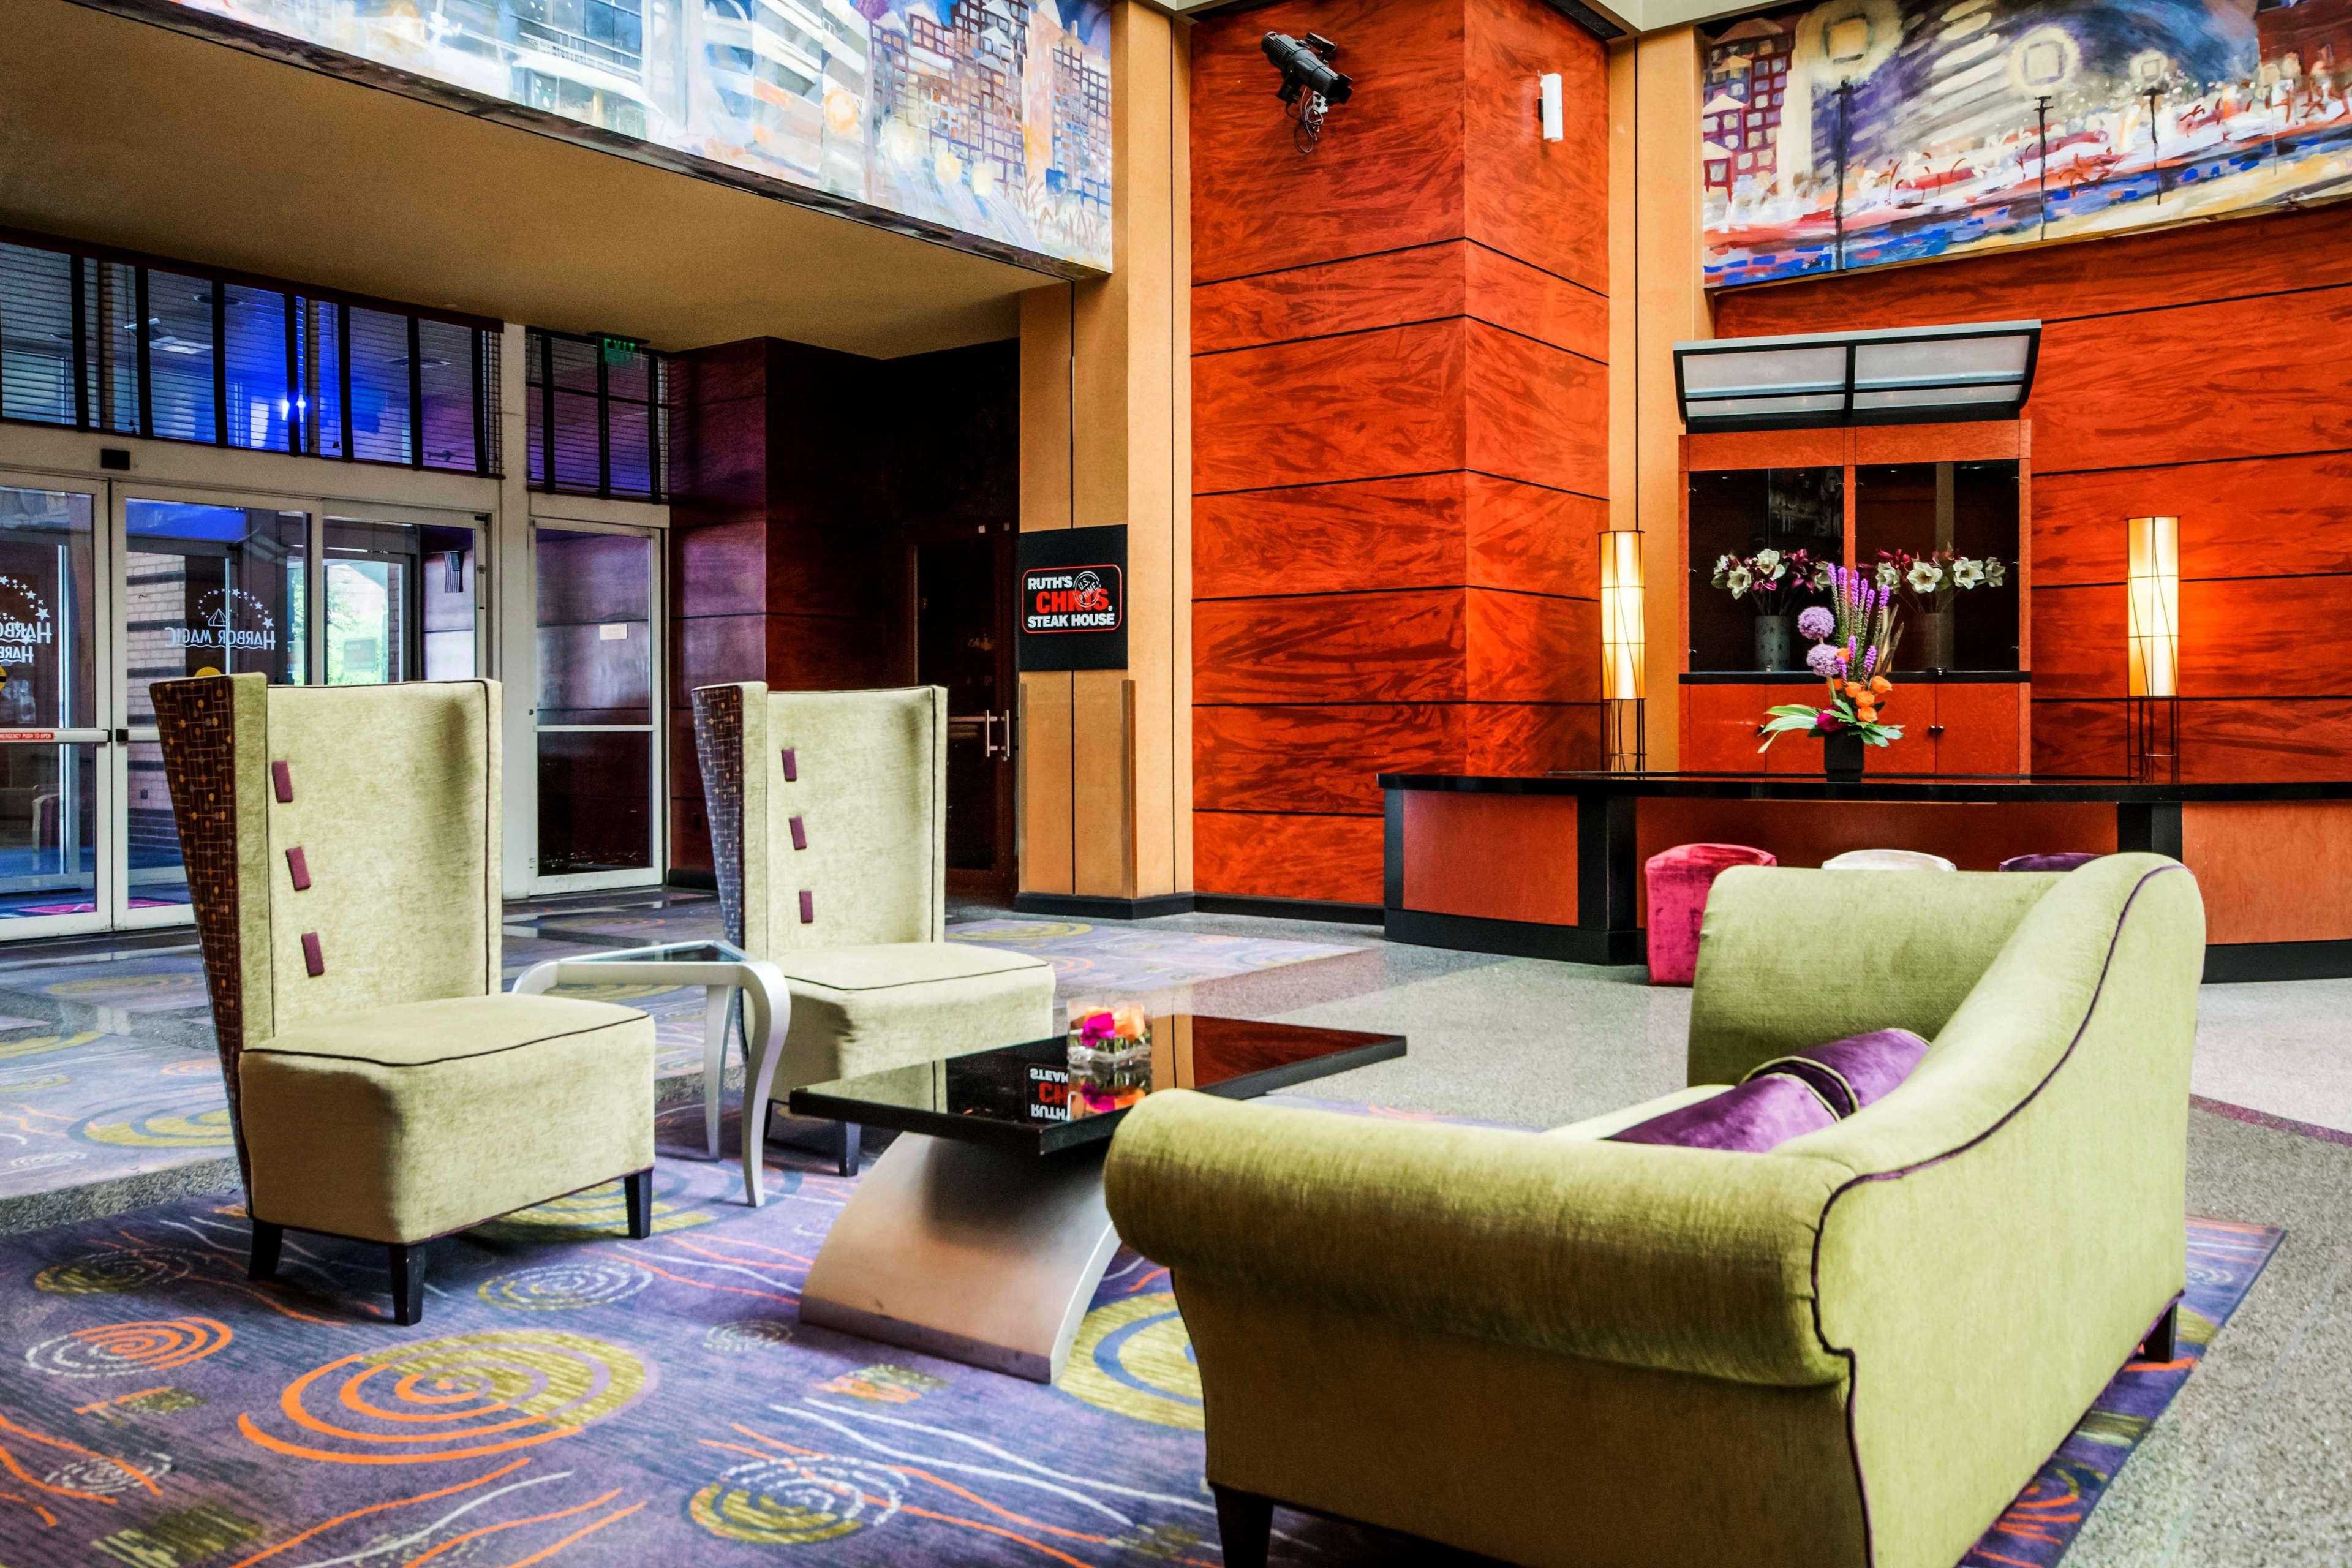 Pier 5 Hotel Baltimore, Curio Collection by Hilton image 6